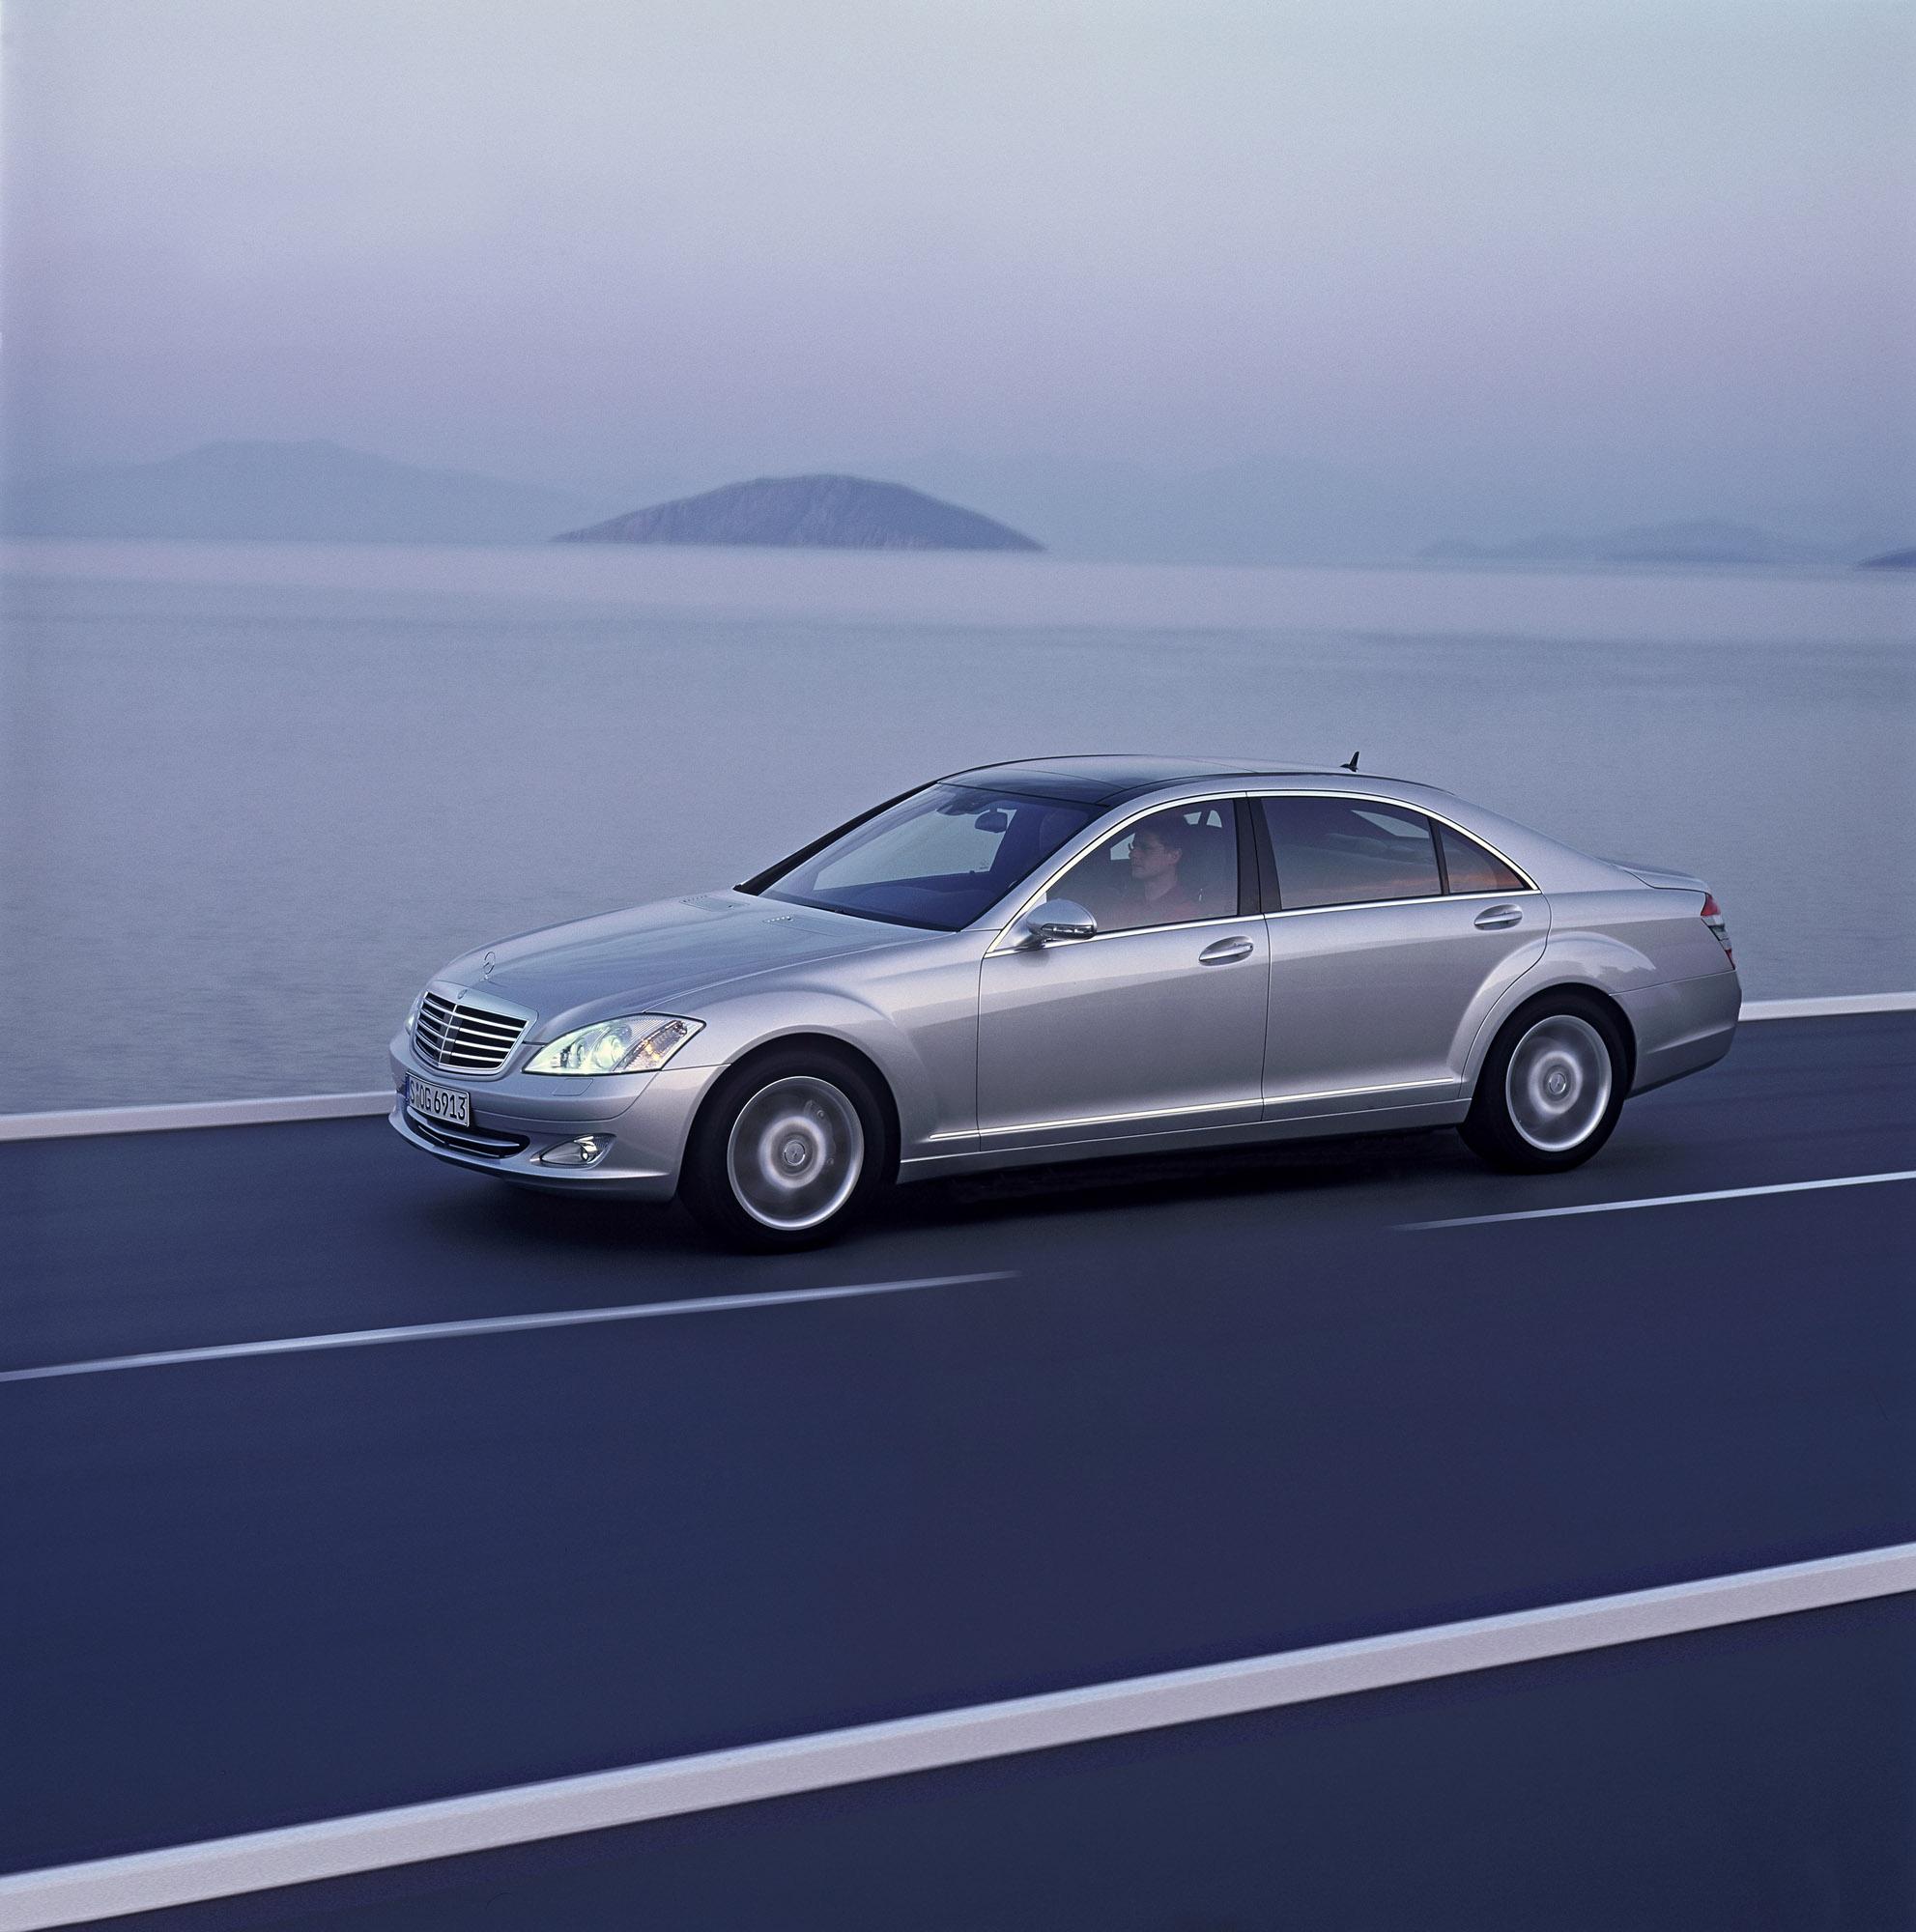 2006 Mercedes Benz Cls Class Camshaft: 2012 Wald Mercedes-Benz CLS Black Bison